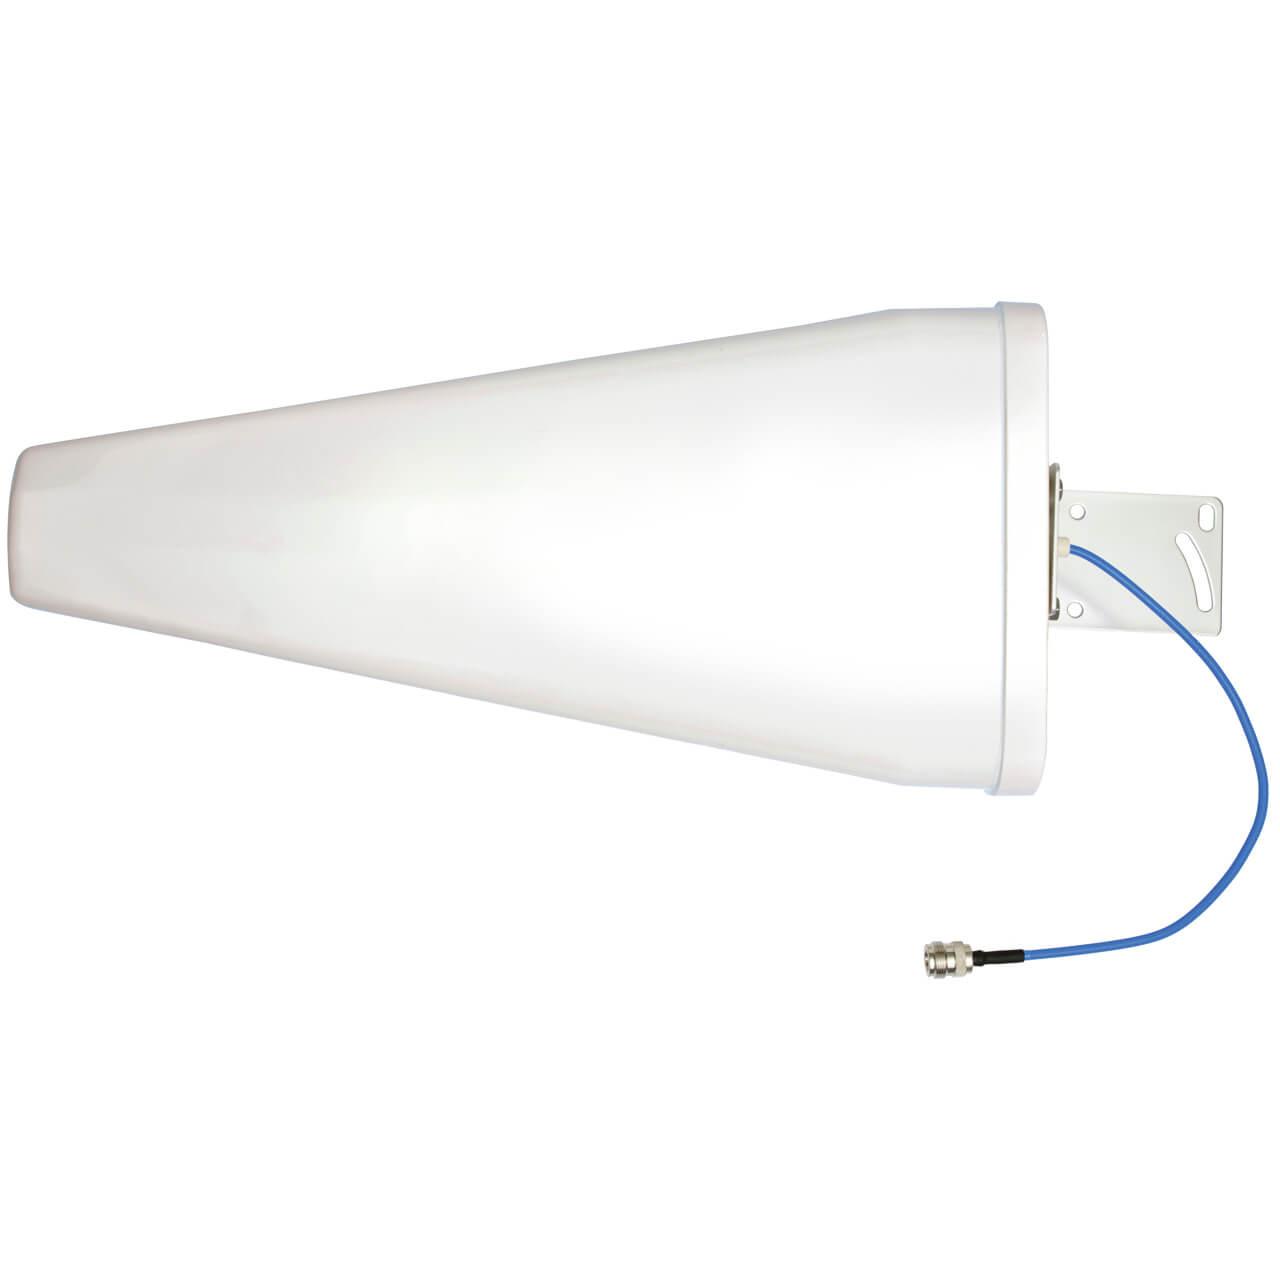 The Quicksilver 5G - Yagi Directional Antenna